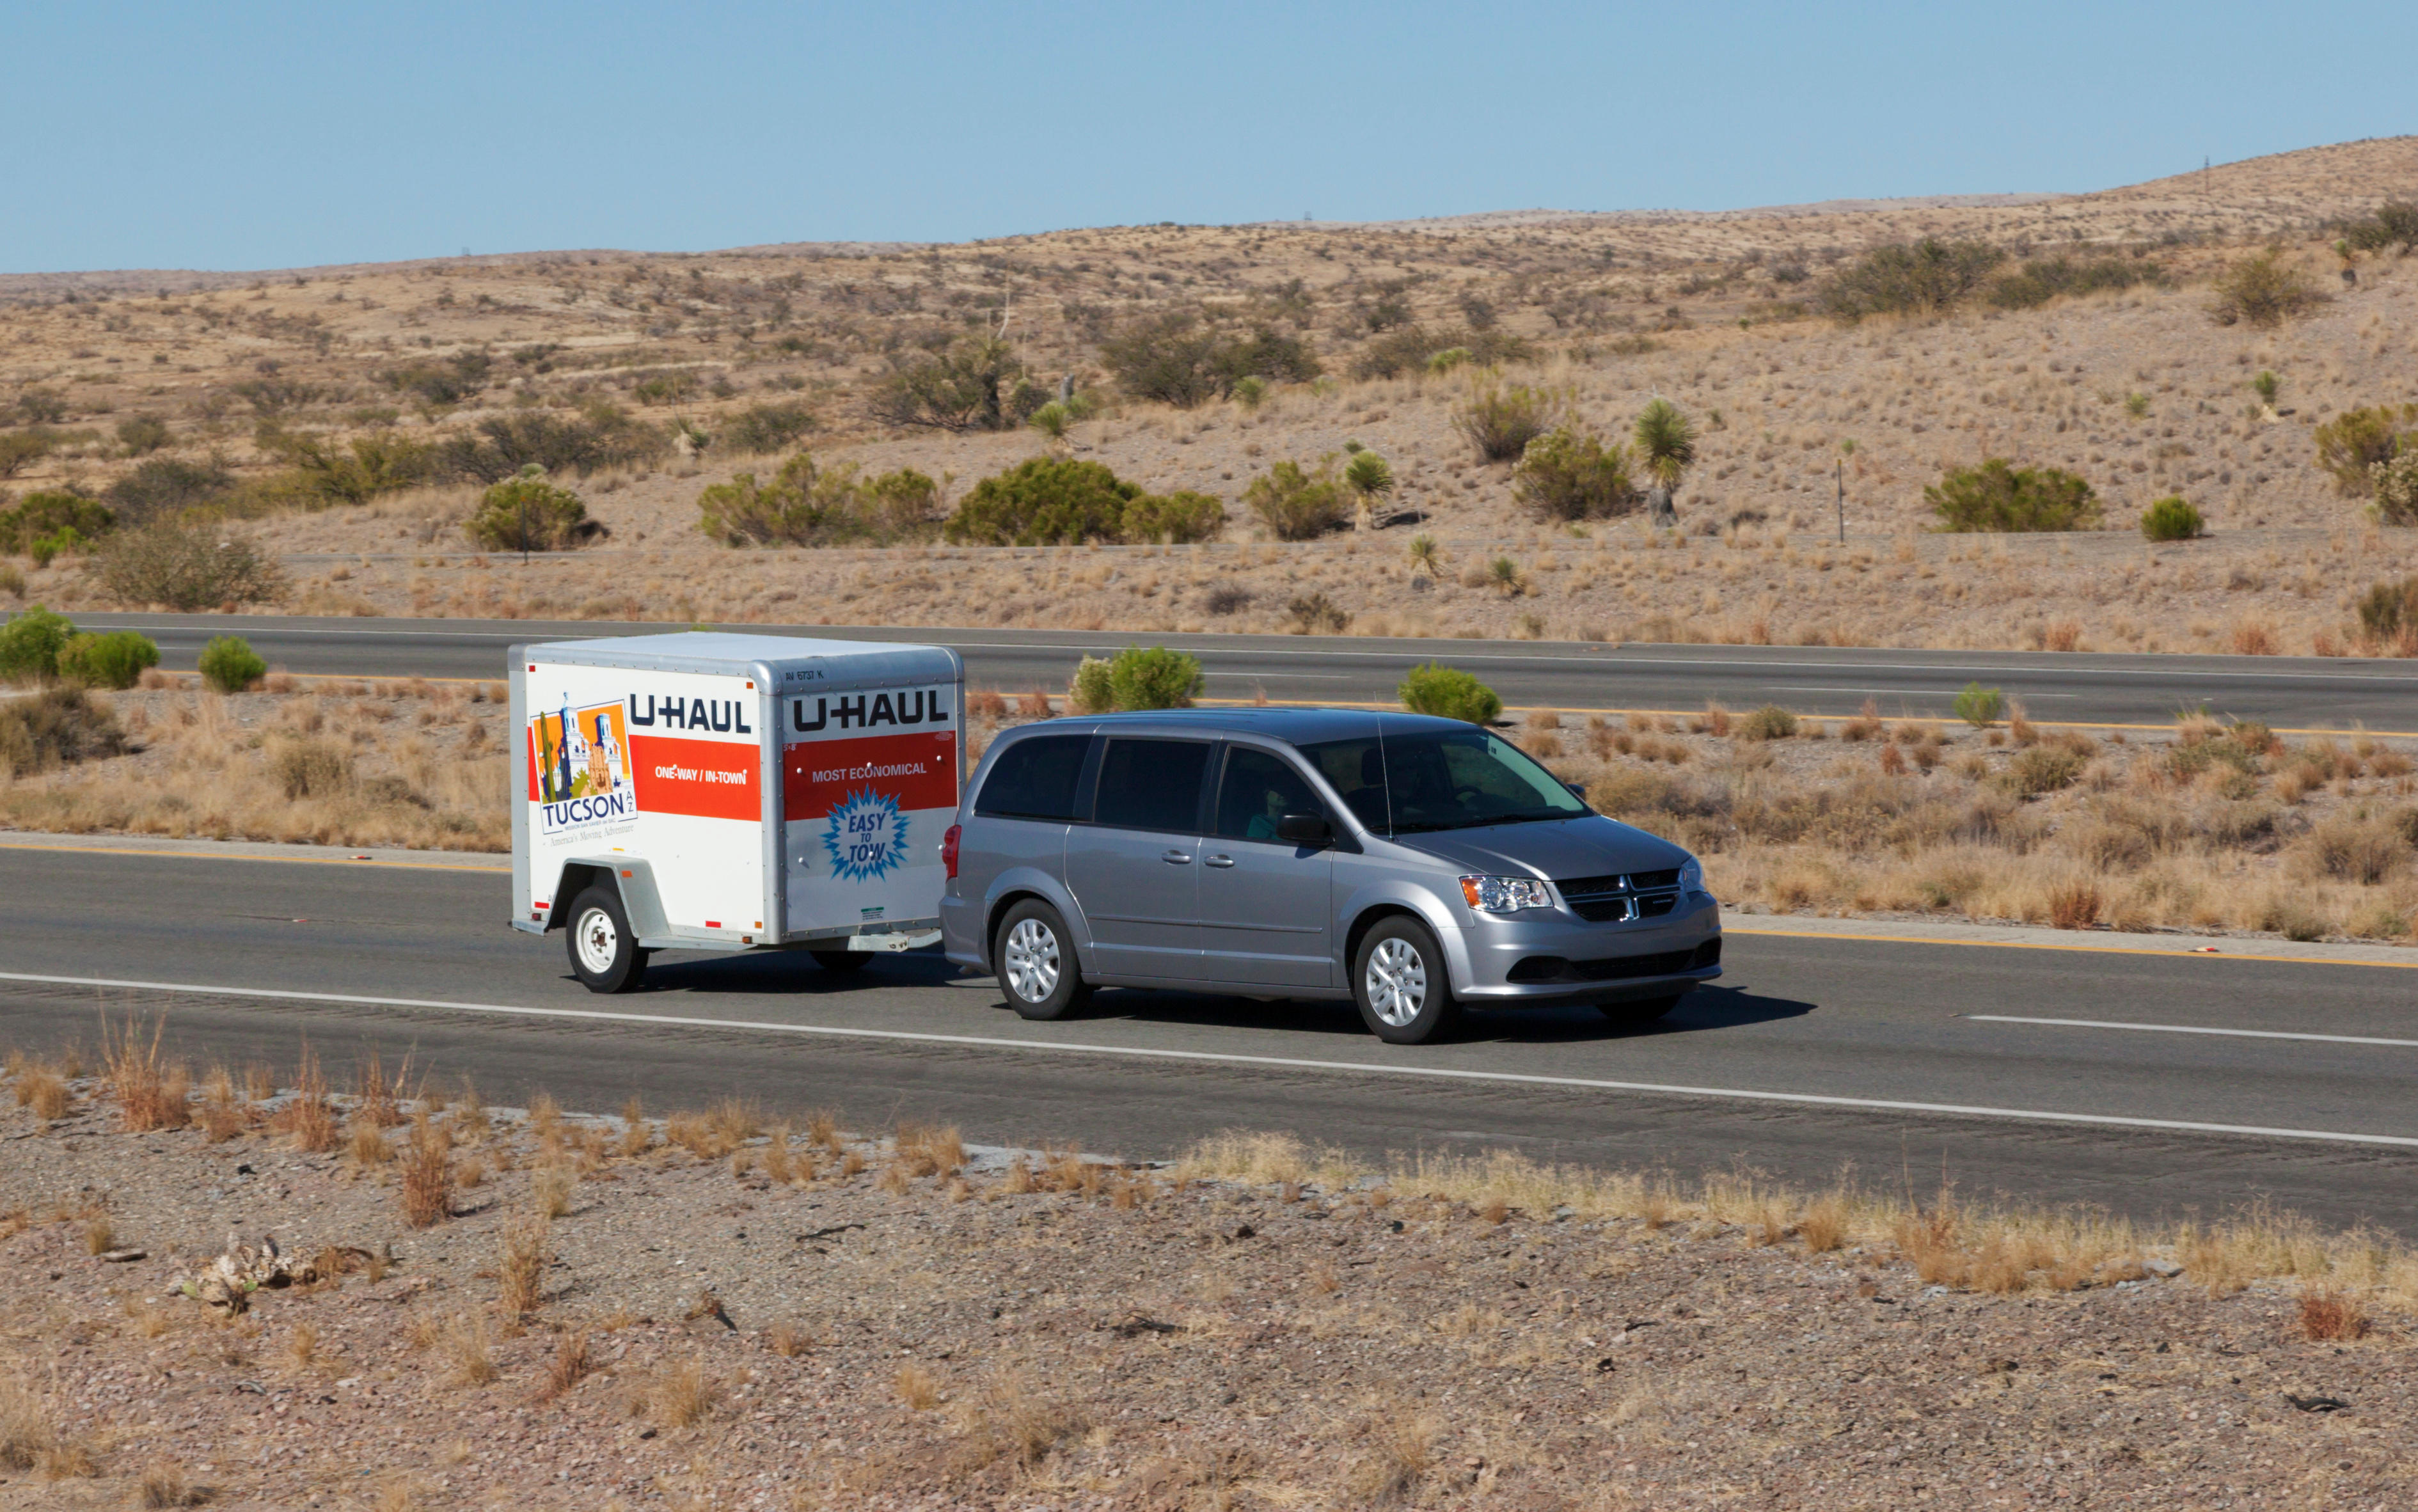 Van driving with a U-Haul trailer in the desert